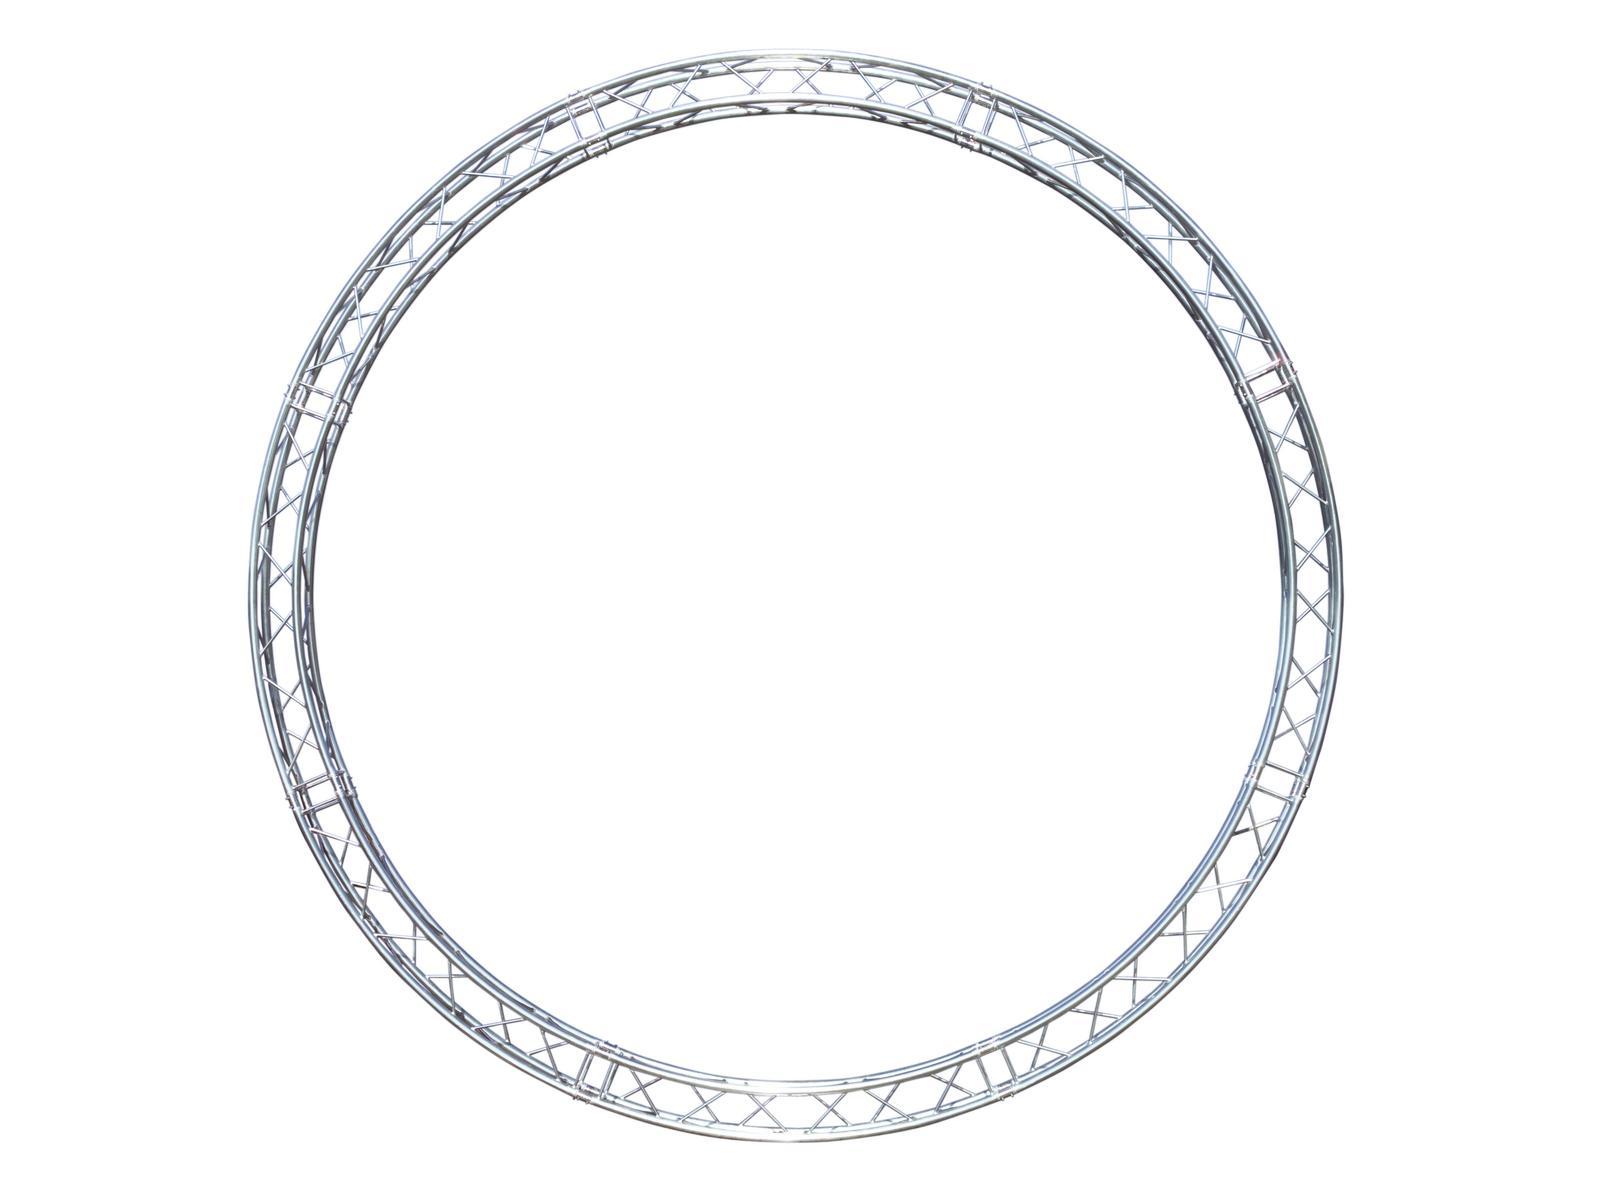 ALUTRUSS QUADLOCK 6082 cerchio d=5m (all'interno)